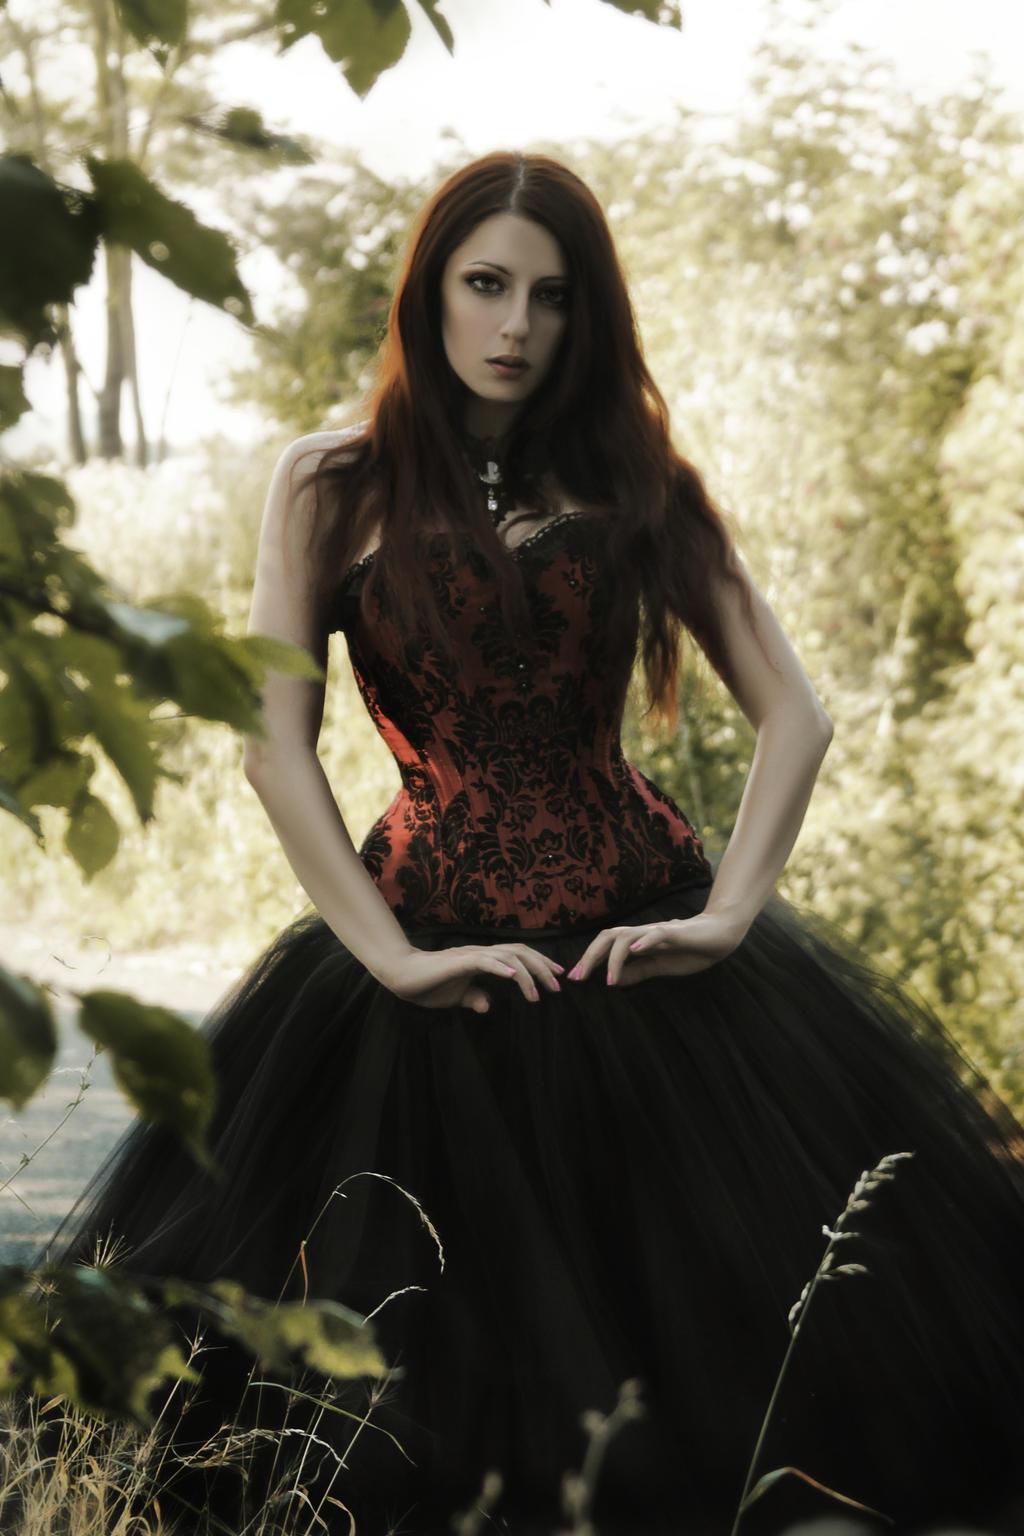 Красивые фото девушек в стиле готика